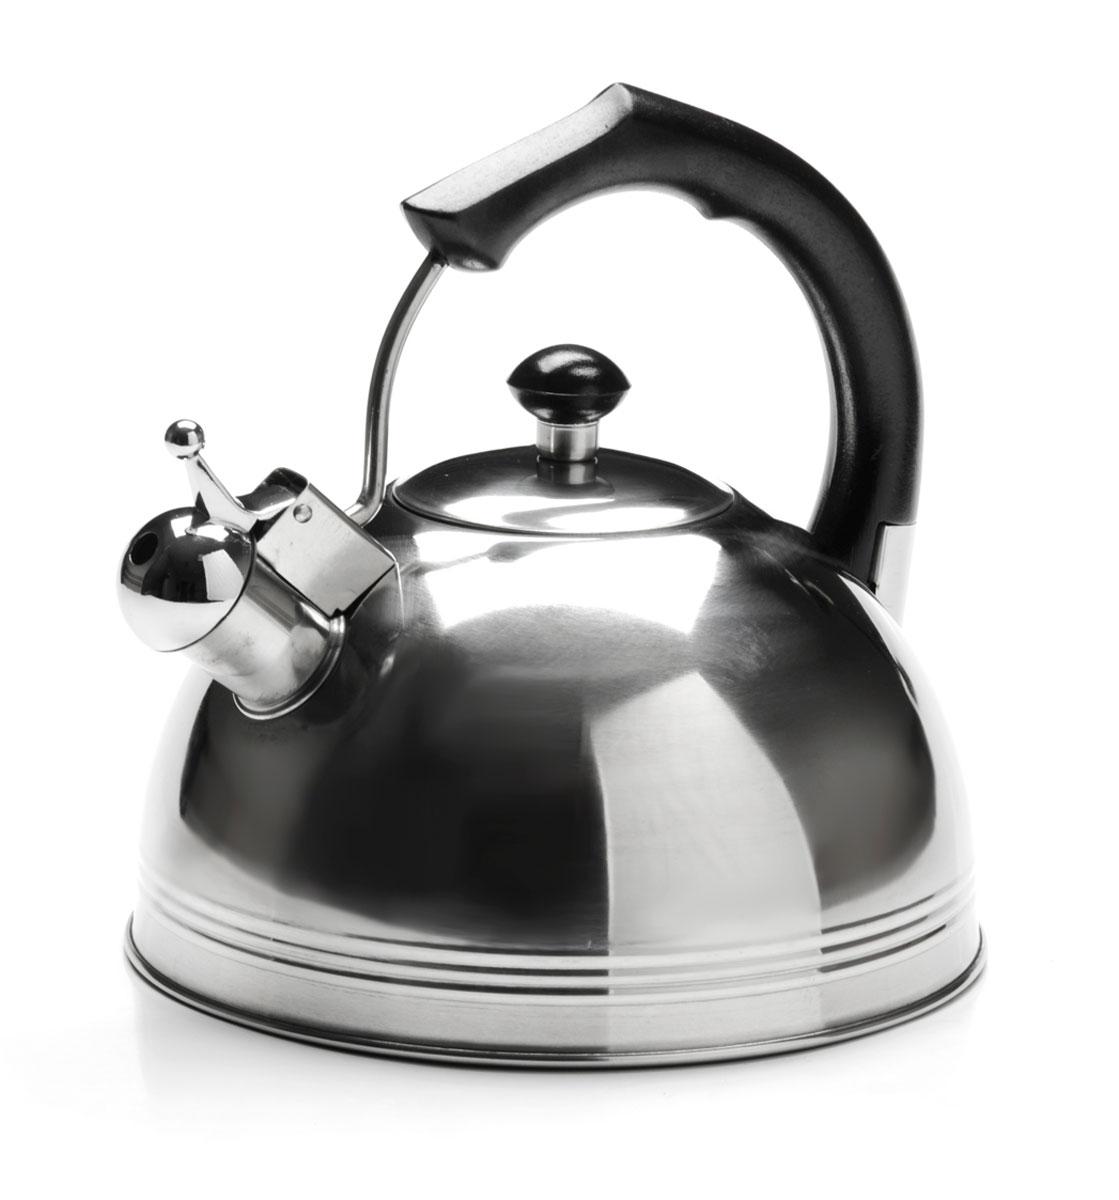 Чайник Mayer & Boch, со свистком, 3,5 л. 2616526165